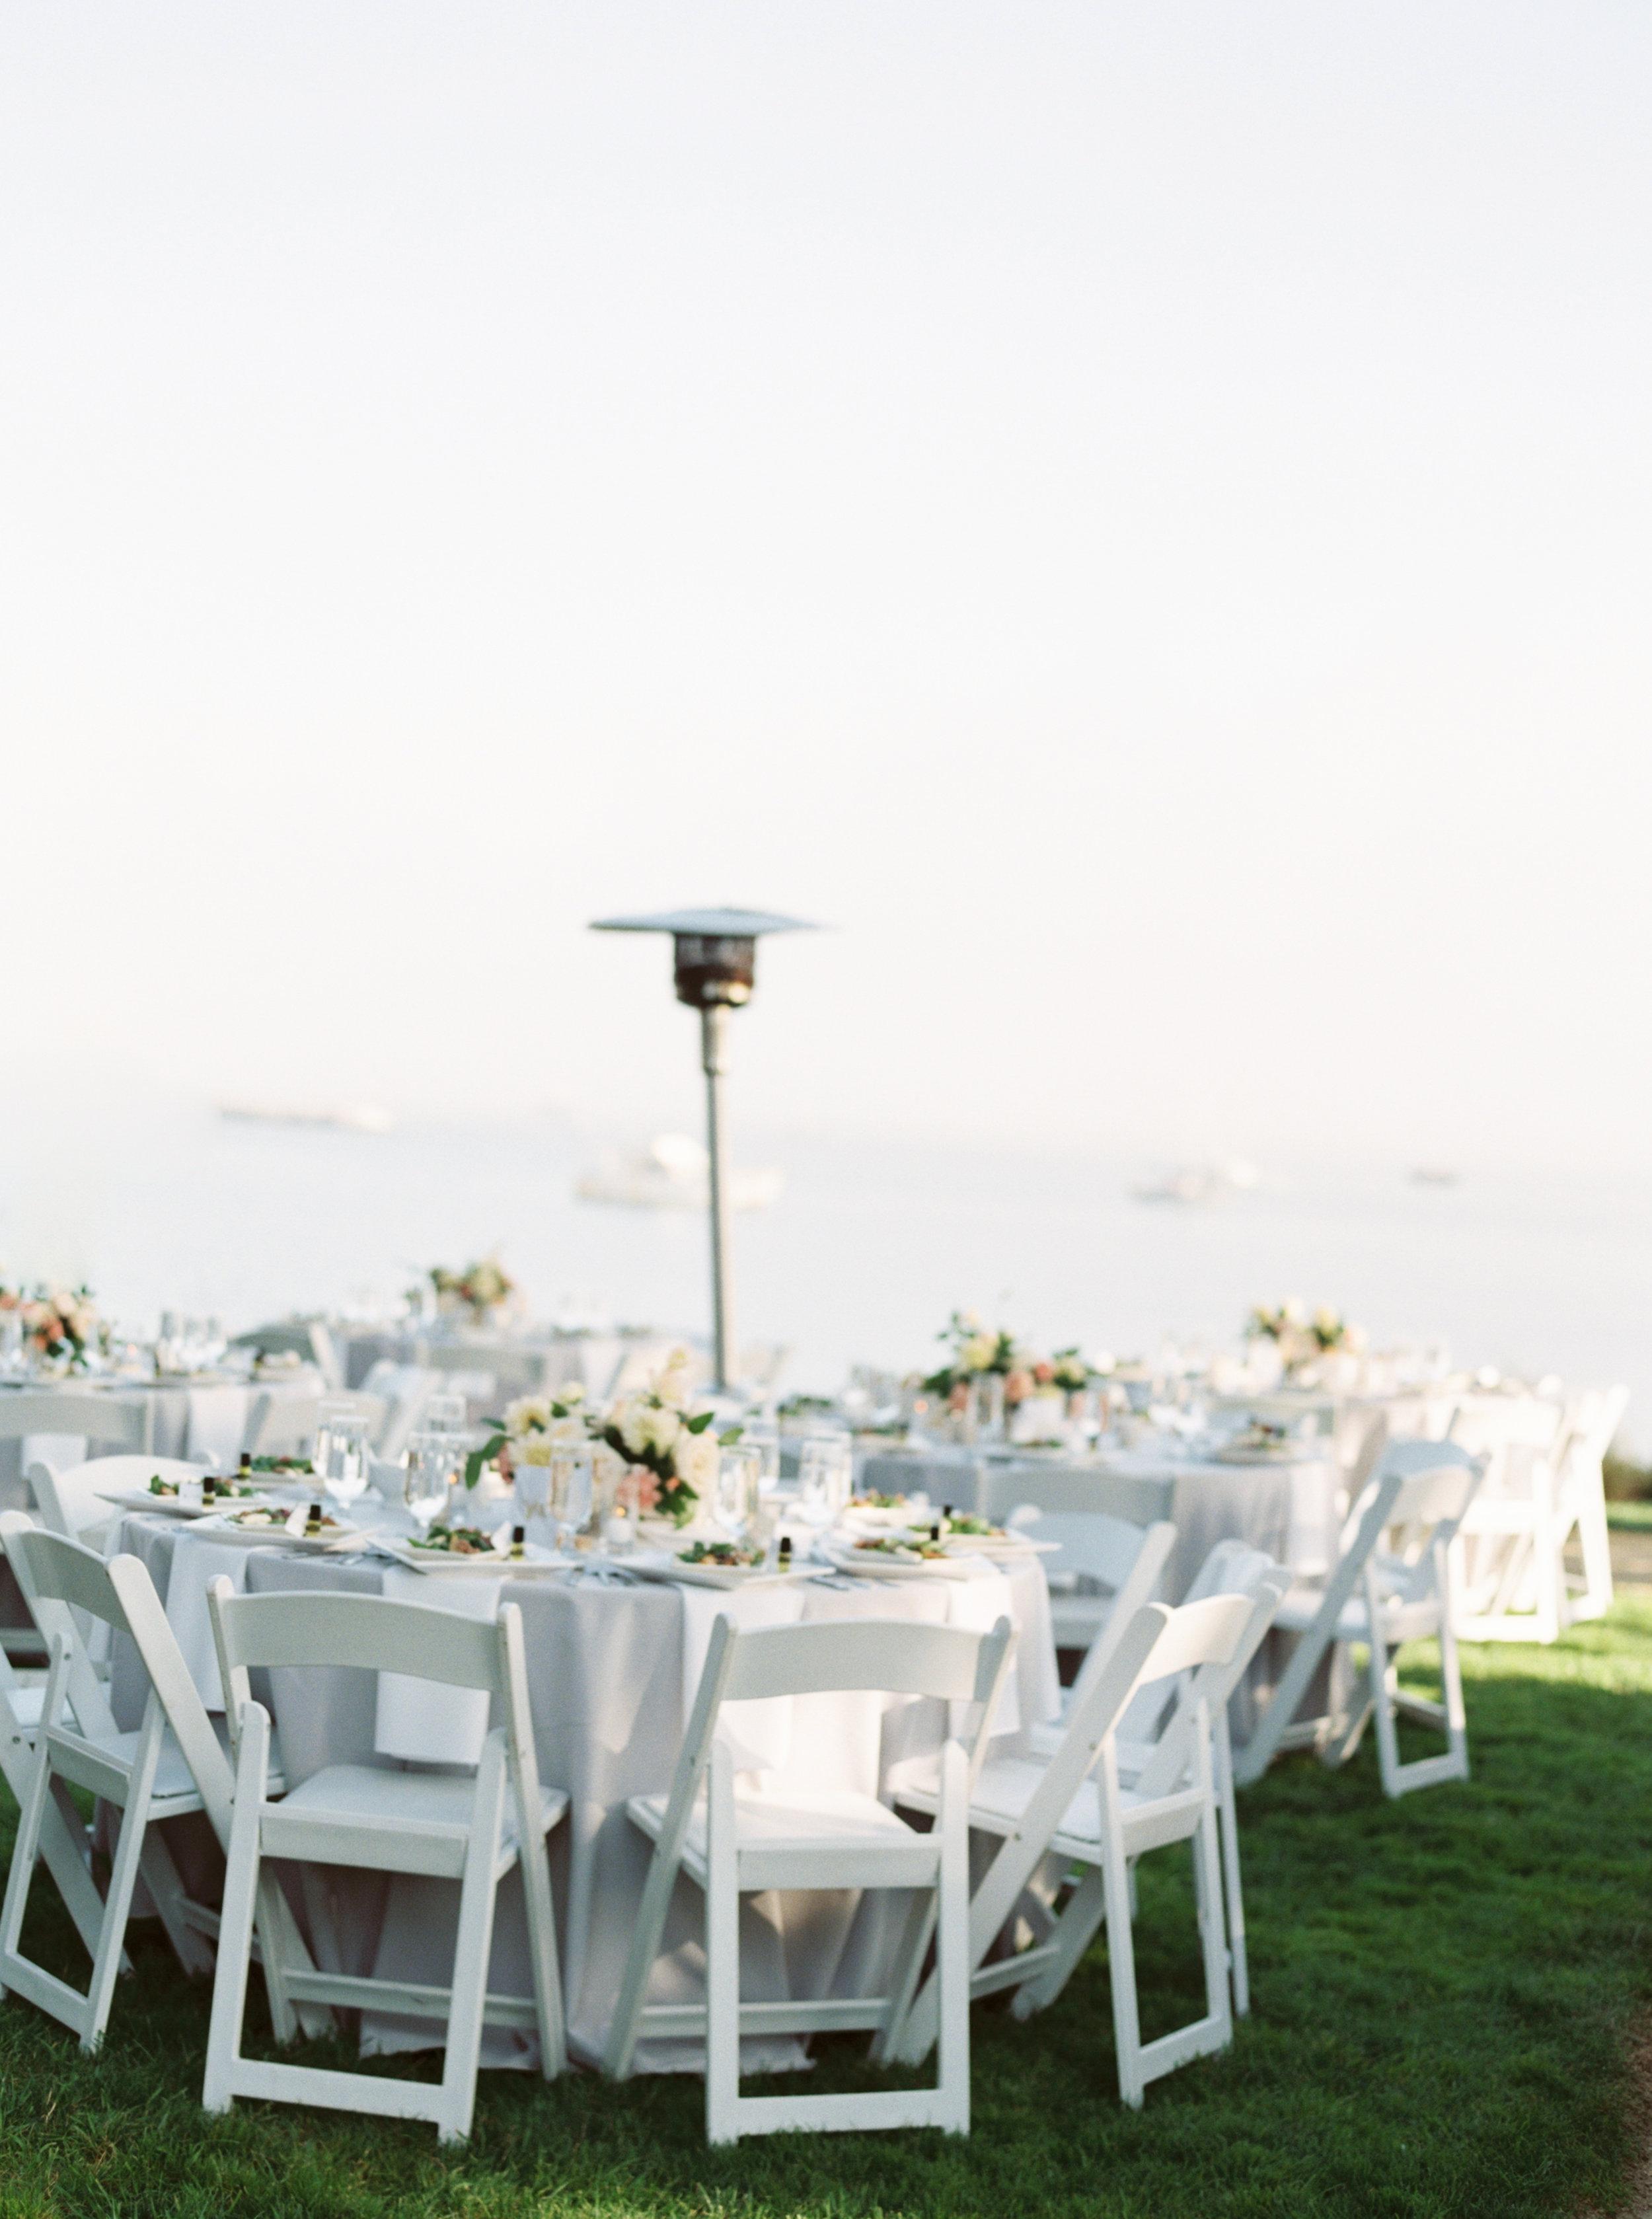 trynhphoto_socal_sf_halfmoon_bay_wedding_photographer_JA-443.jpg